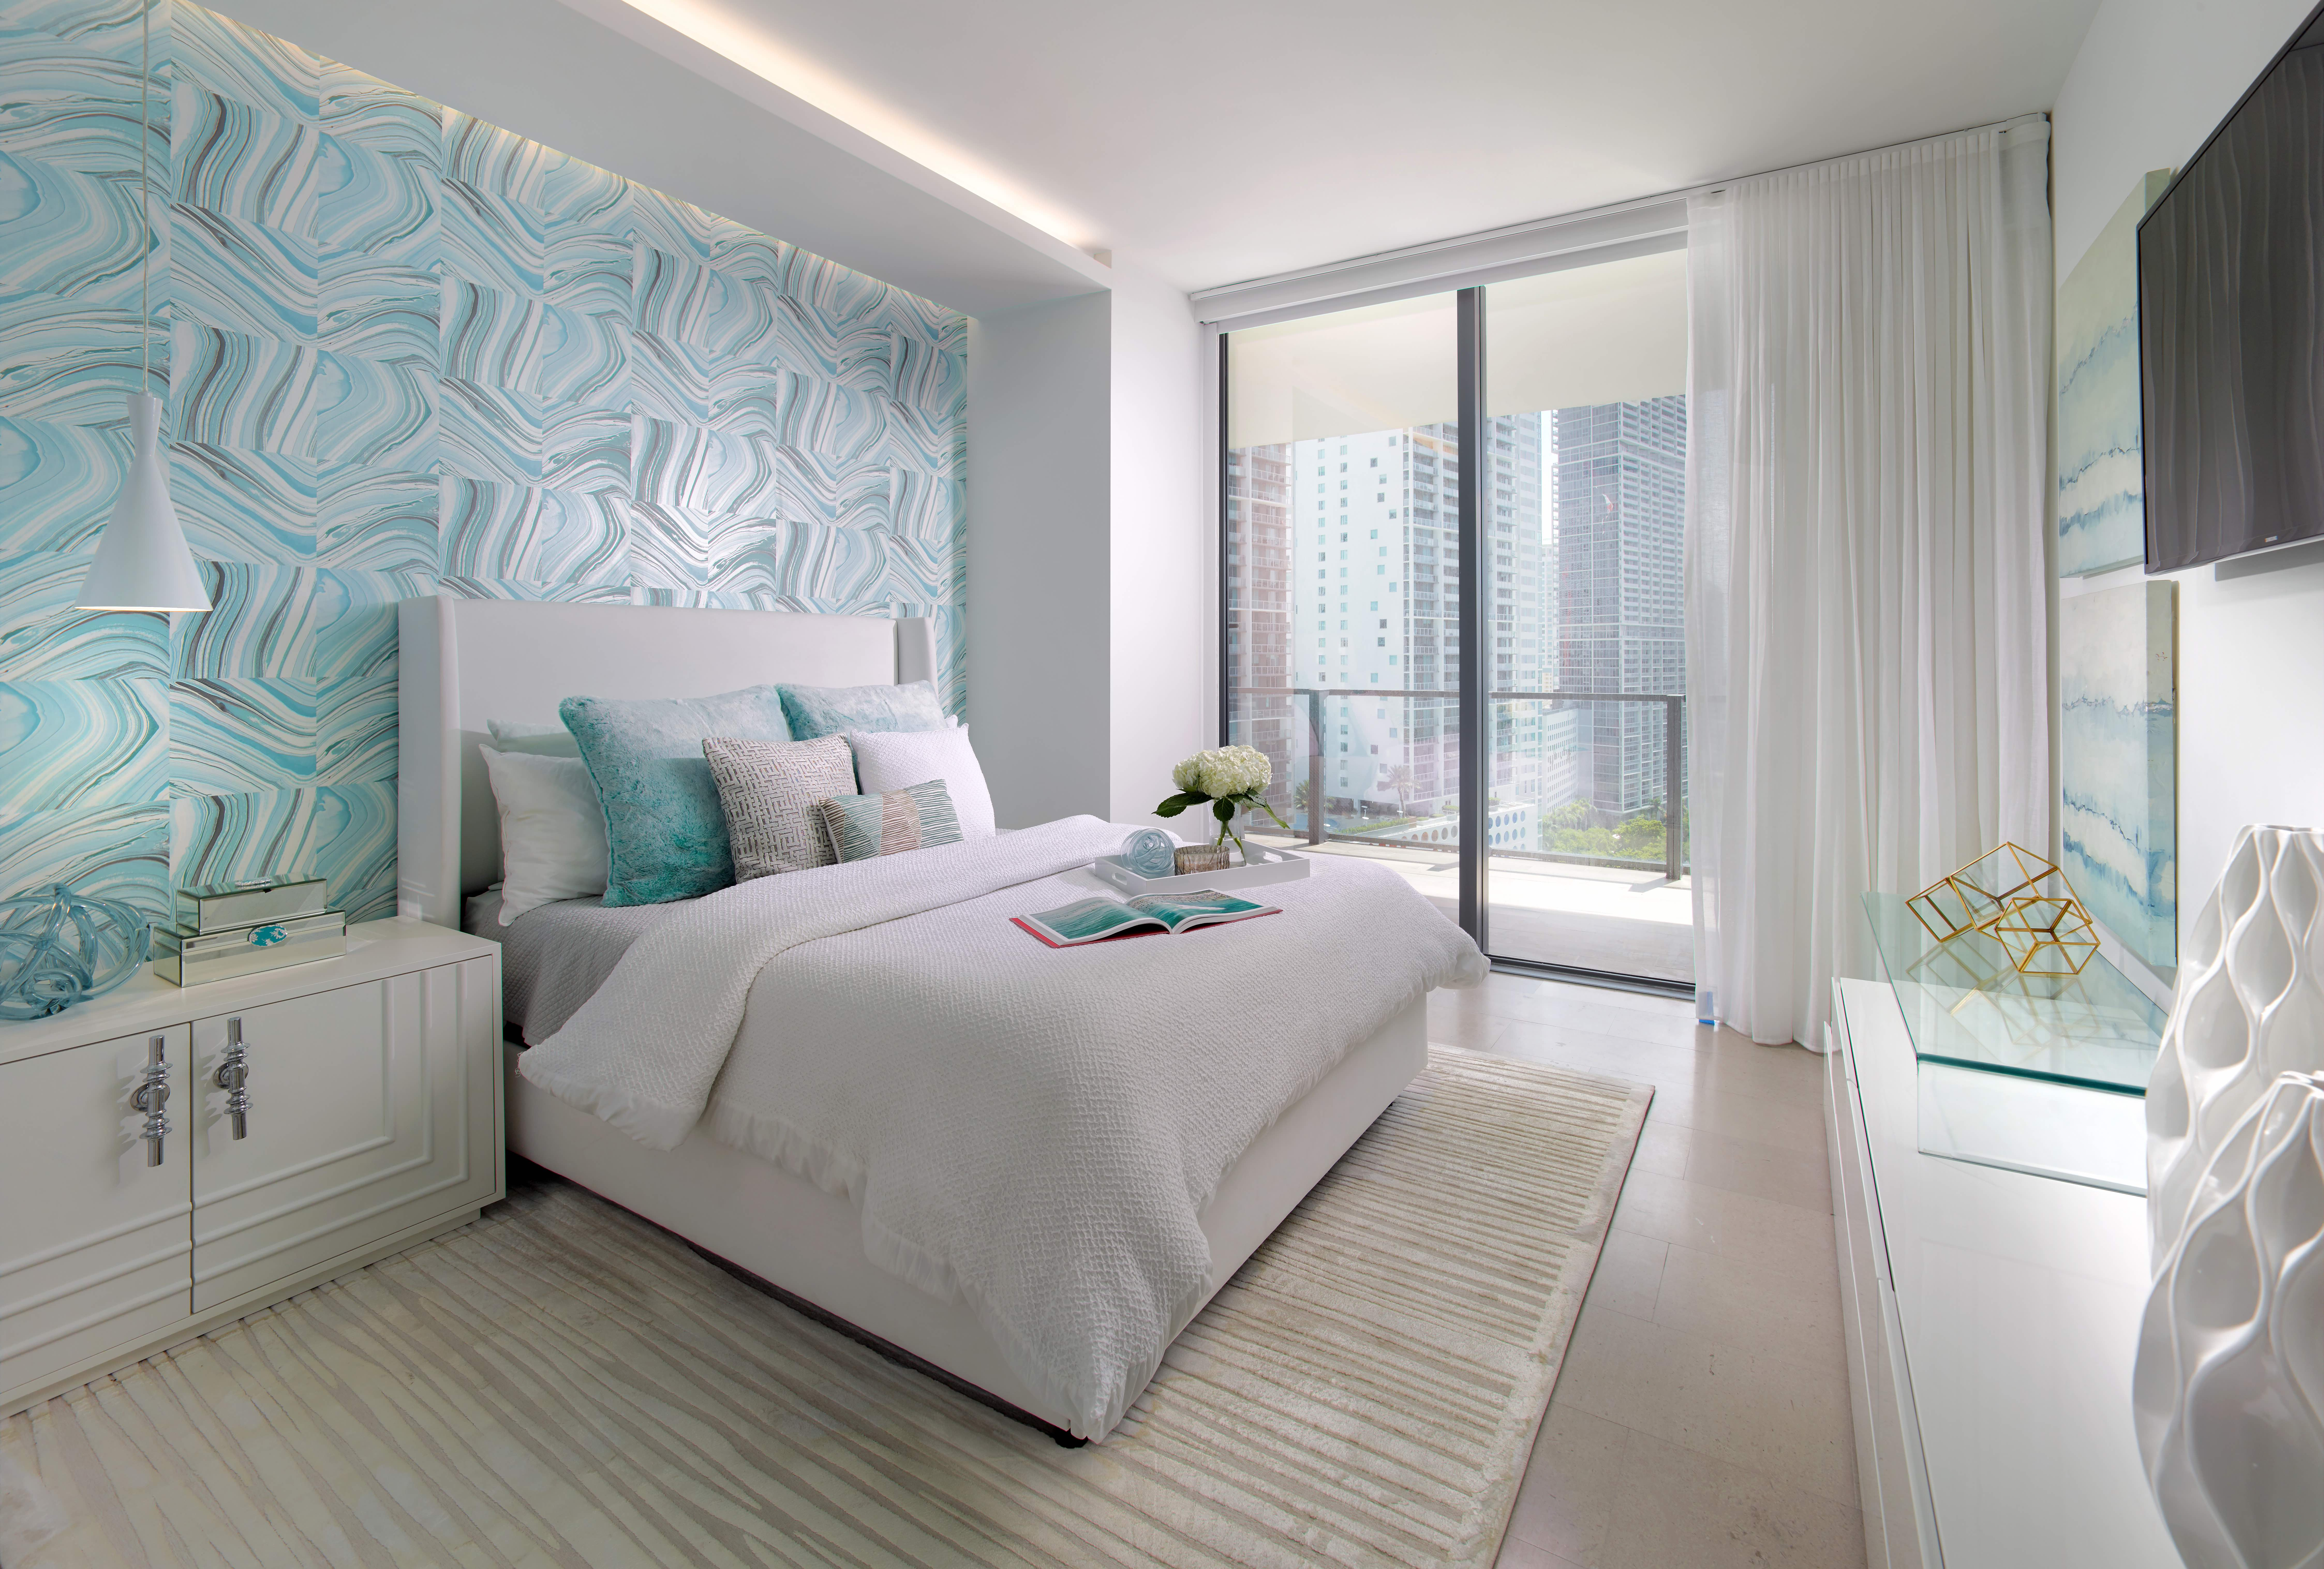 Essential checklist for your bedroom interior design for Interior design online